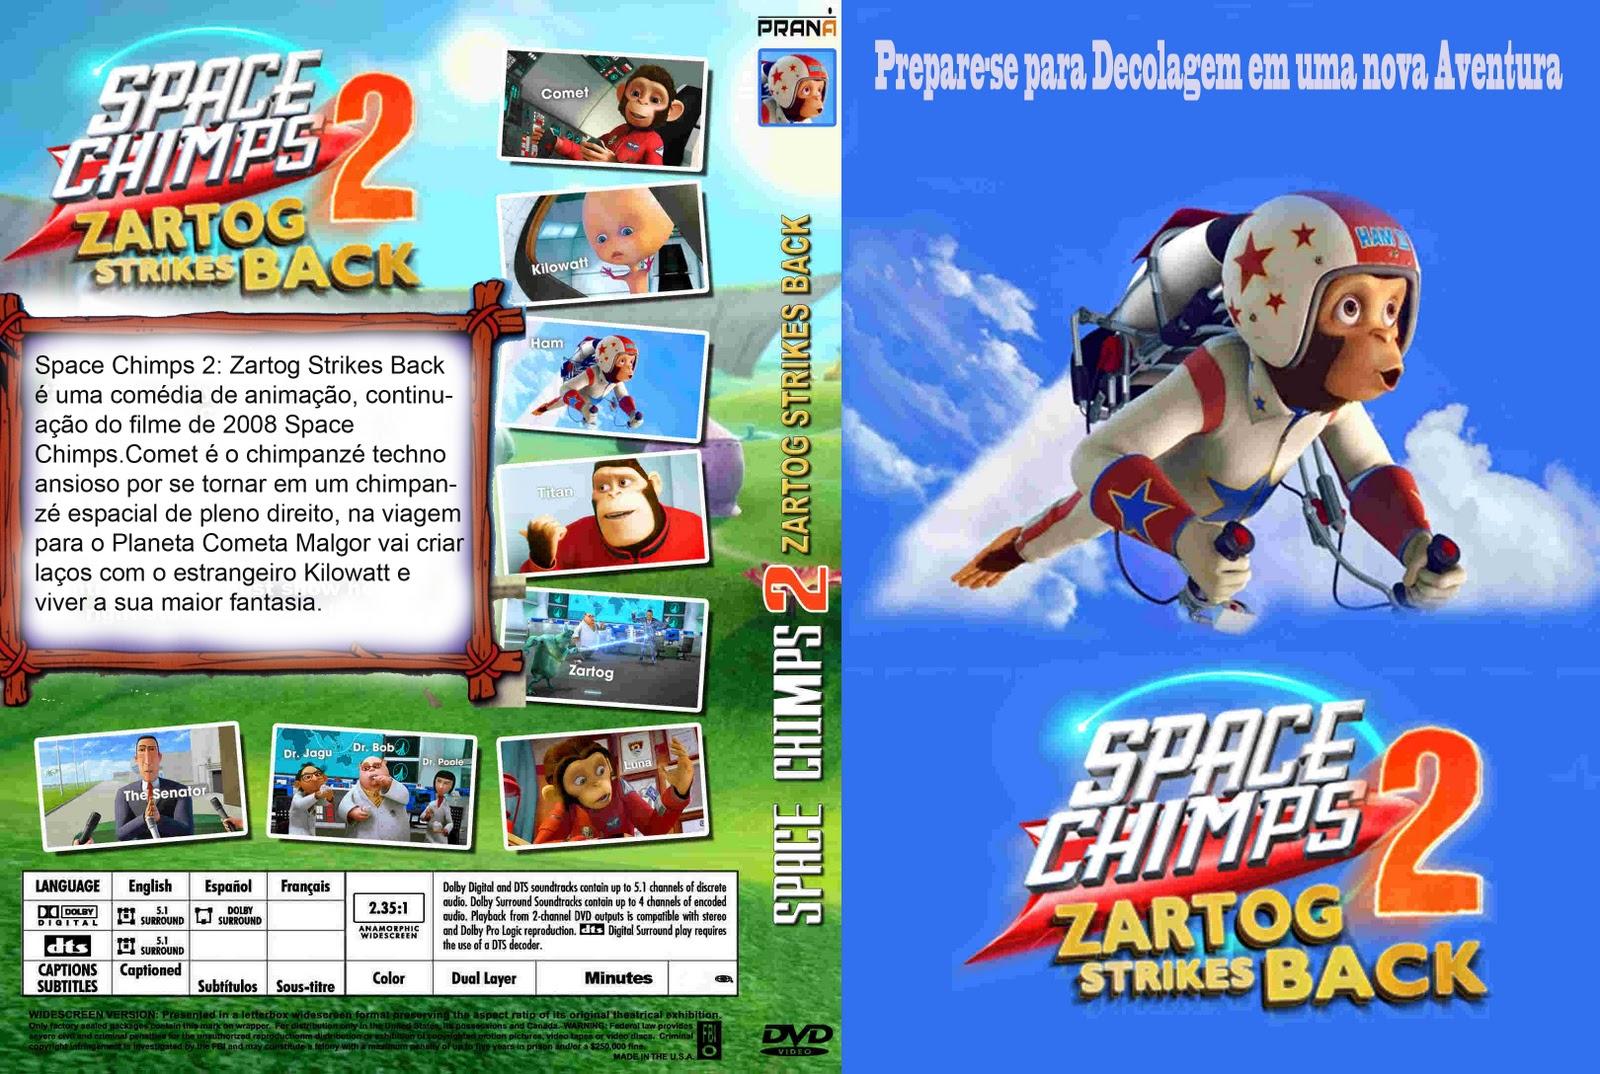 1080p] [hd 1080p] space chimps 2: zartog strikes back (2010) best.